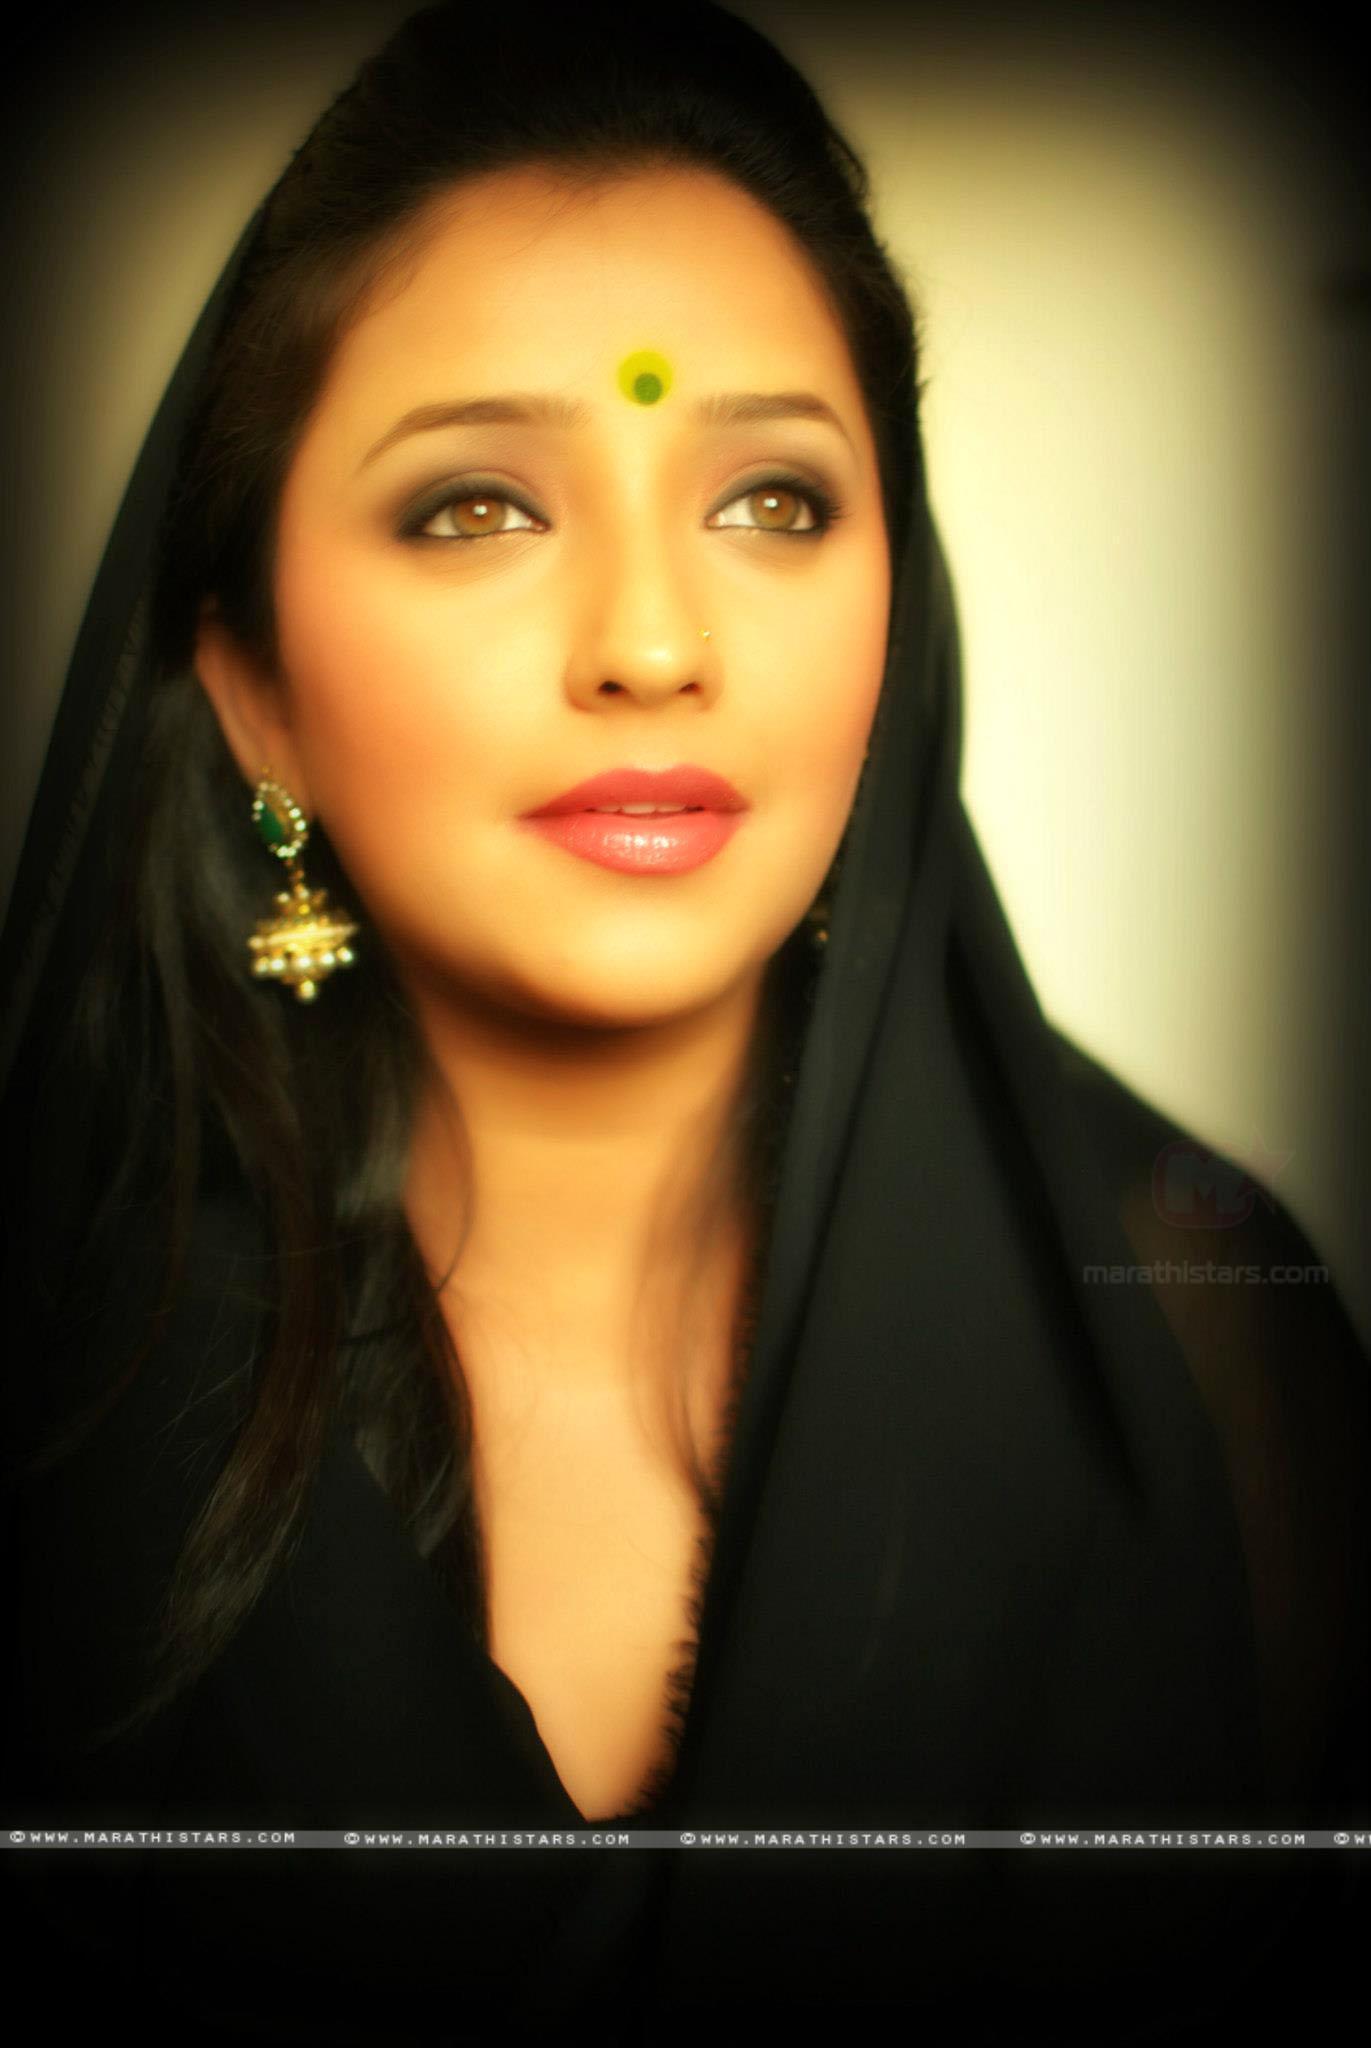 Marathi Girl Hd Wallpaper Apurva Nemlekar Marathi Actress Photos Biography